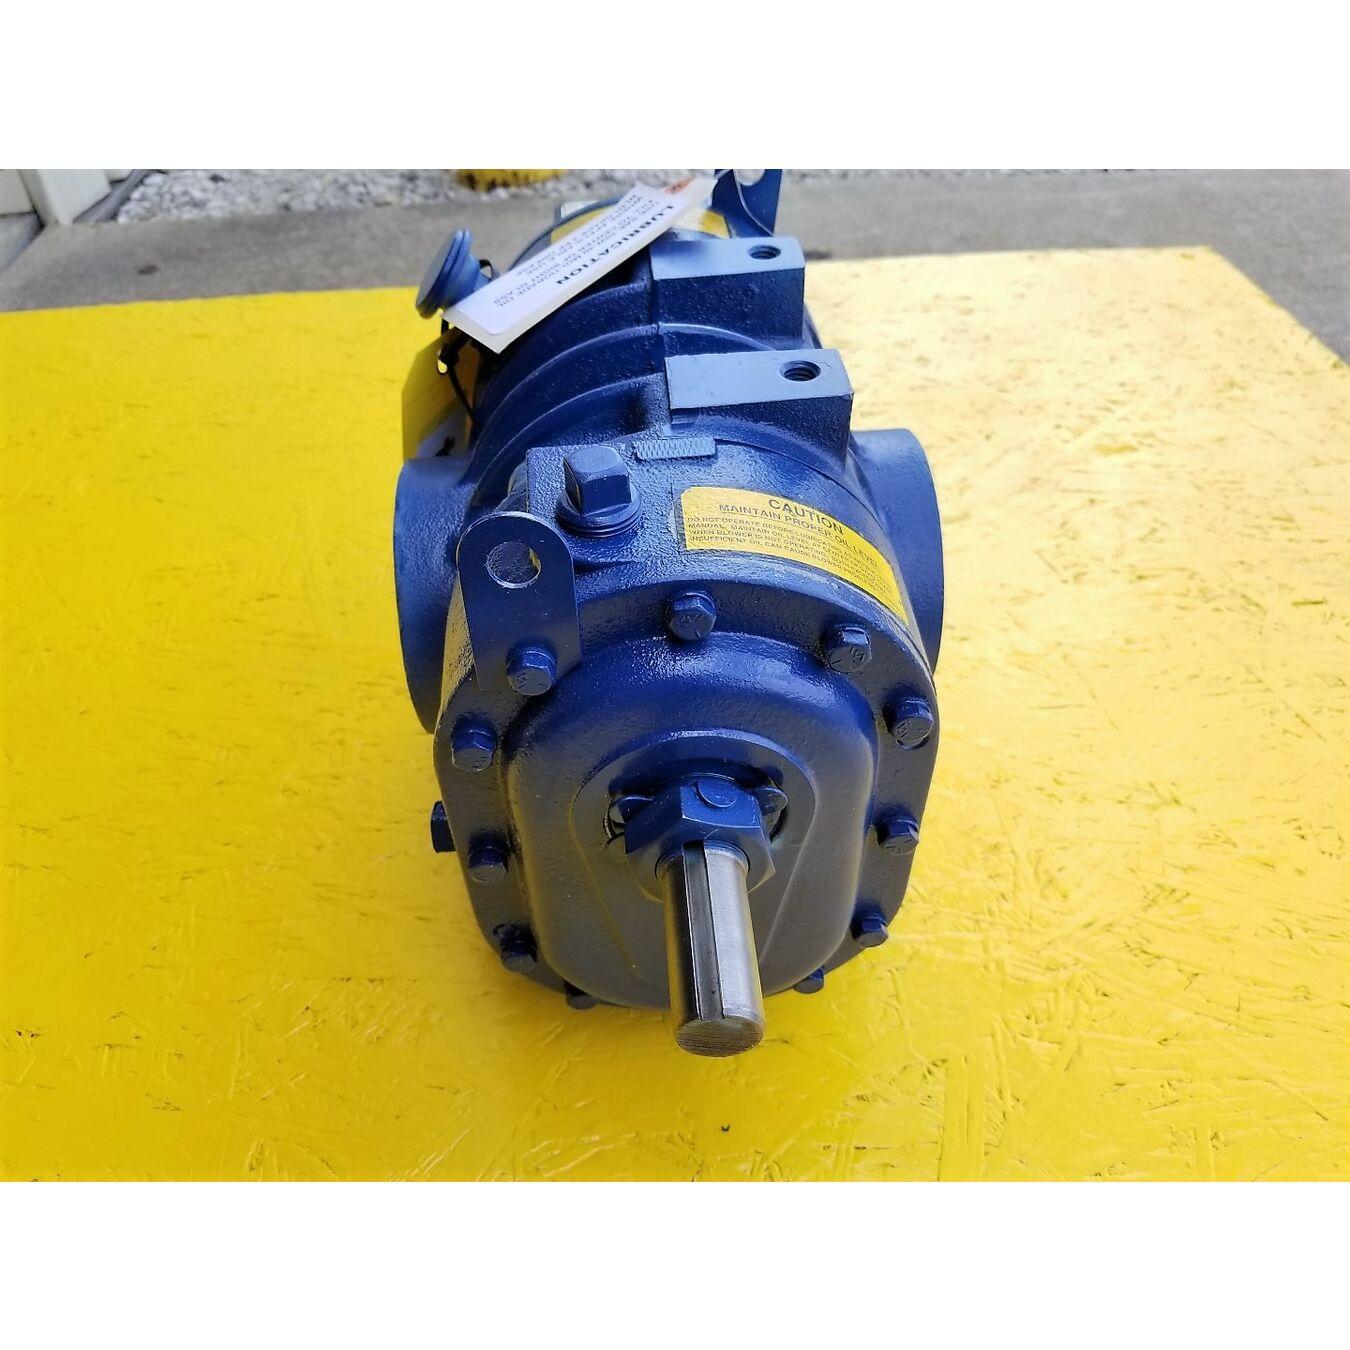 Vacuum Blowers Industrial Process : Gardner denver duroflow positive displacement lobe